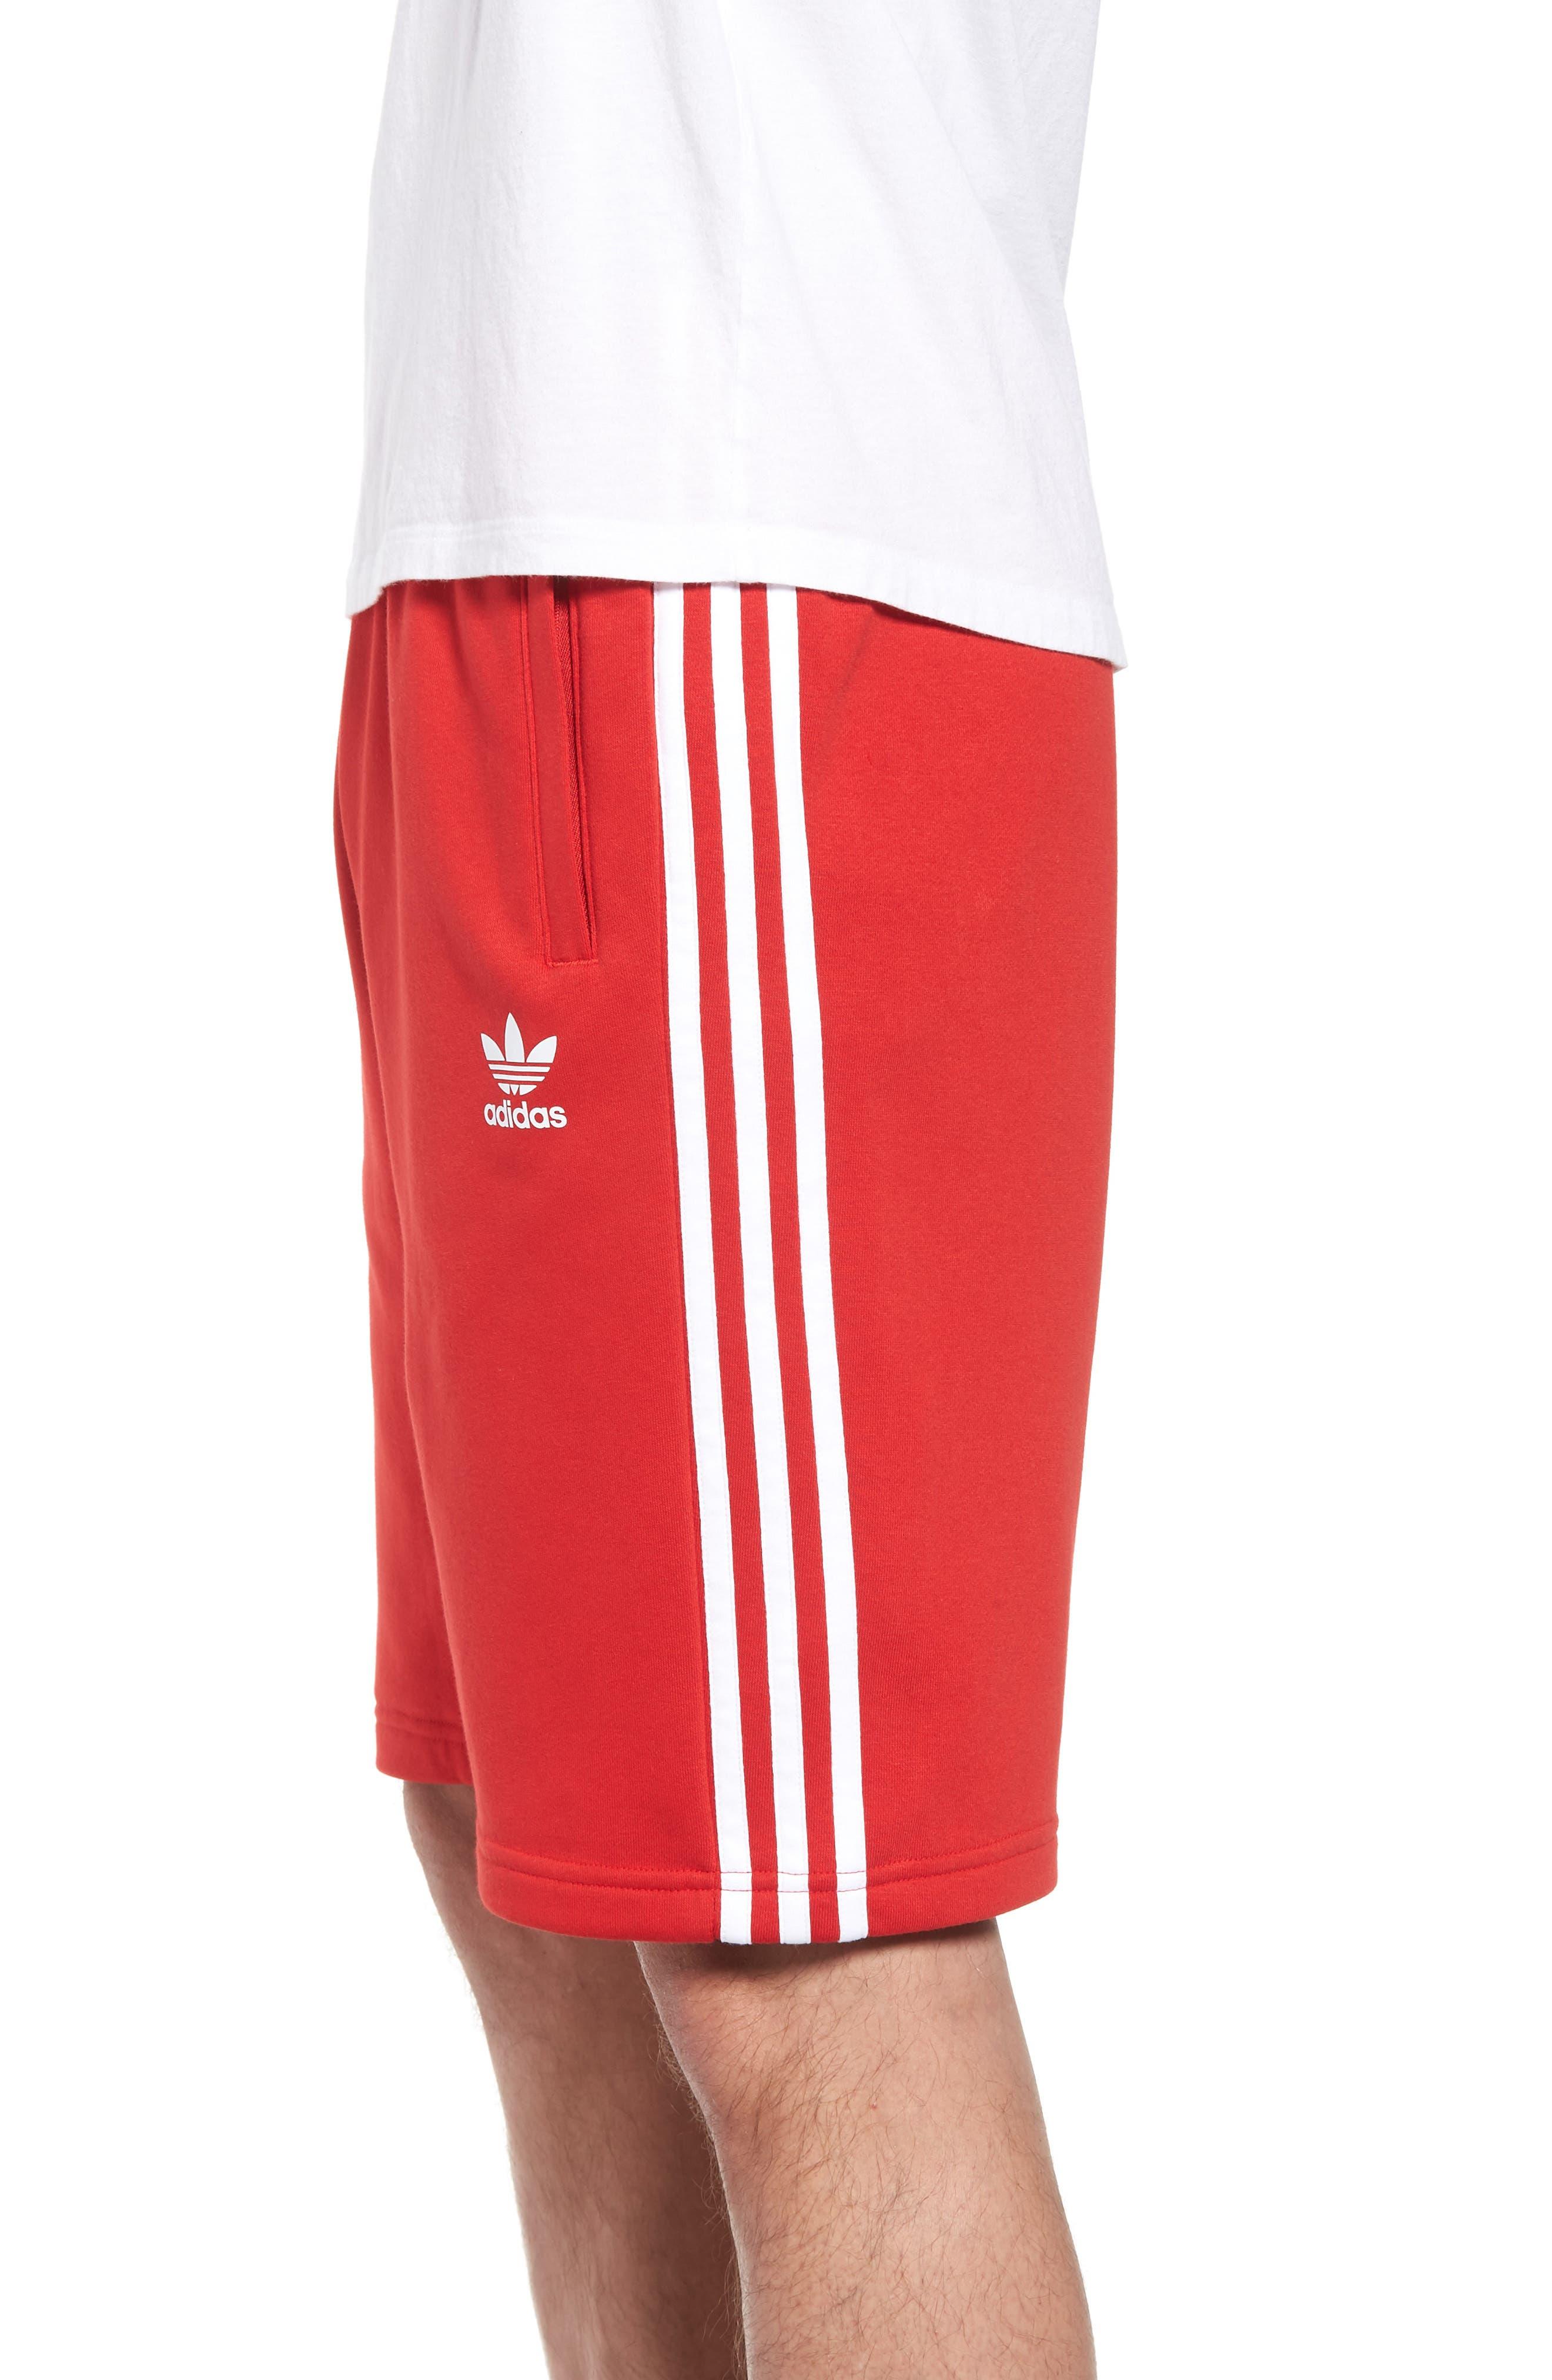 3-Stripes Shorts,                             Alternate thumbnail 3, color,                             Red/ White